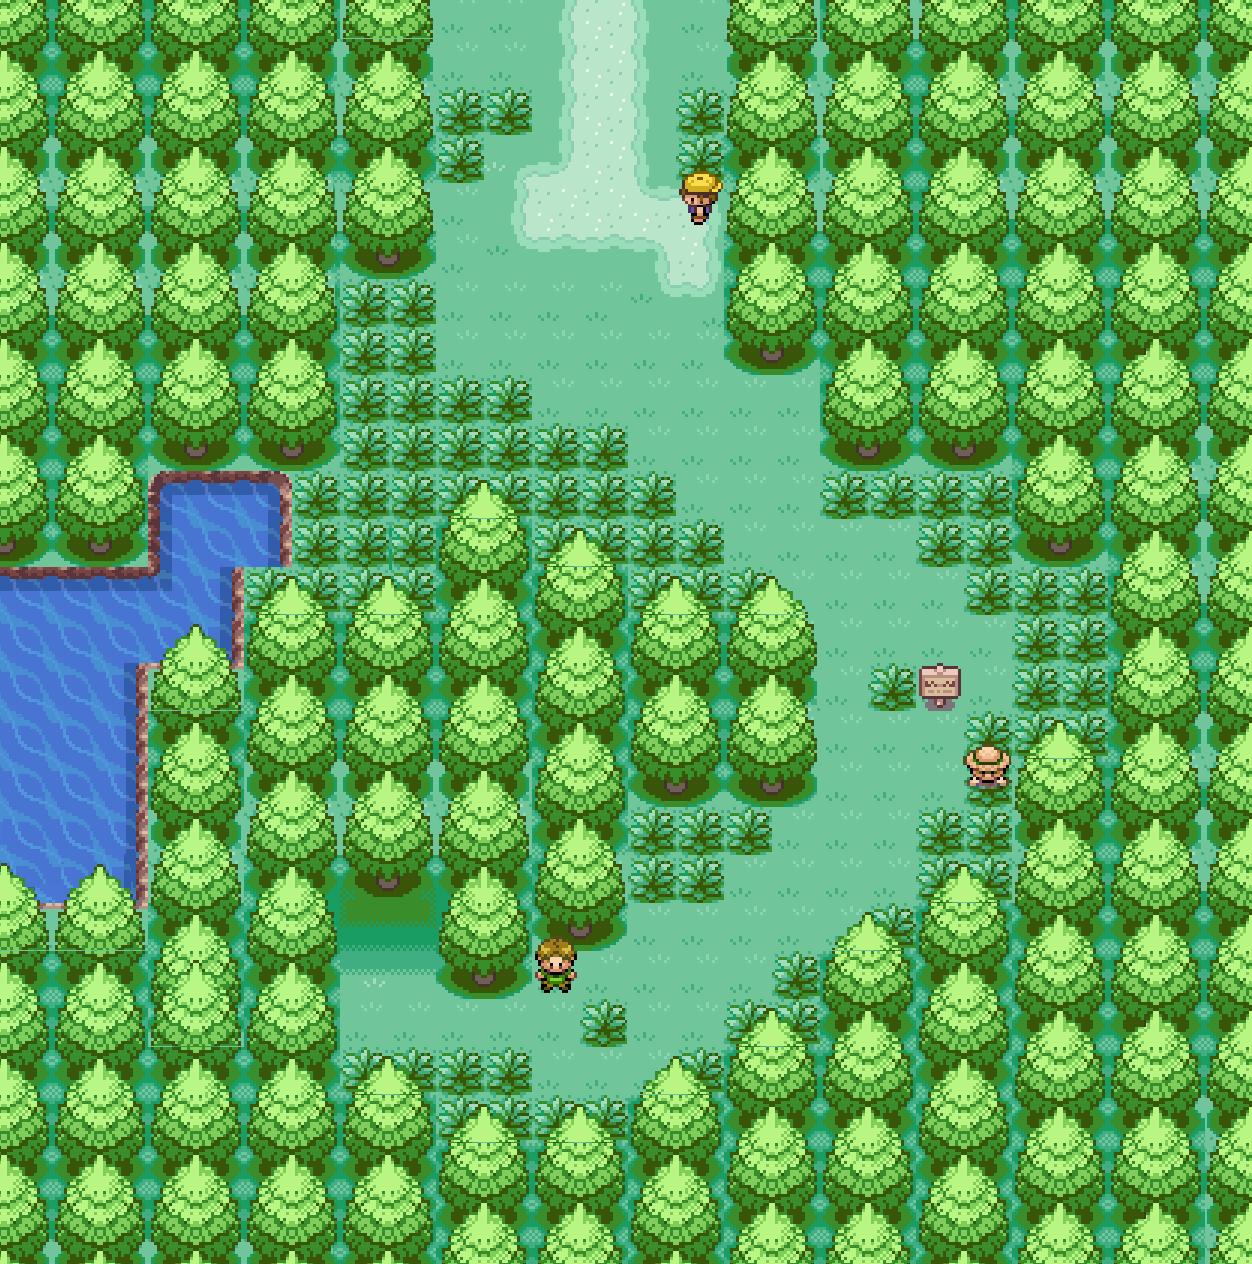 Route  Pokemon Zeta Omicron Wiki FANDOM Powered By Wikia - Us route 301 map